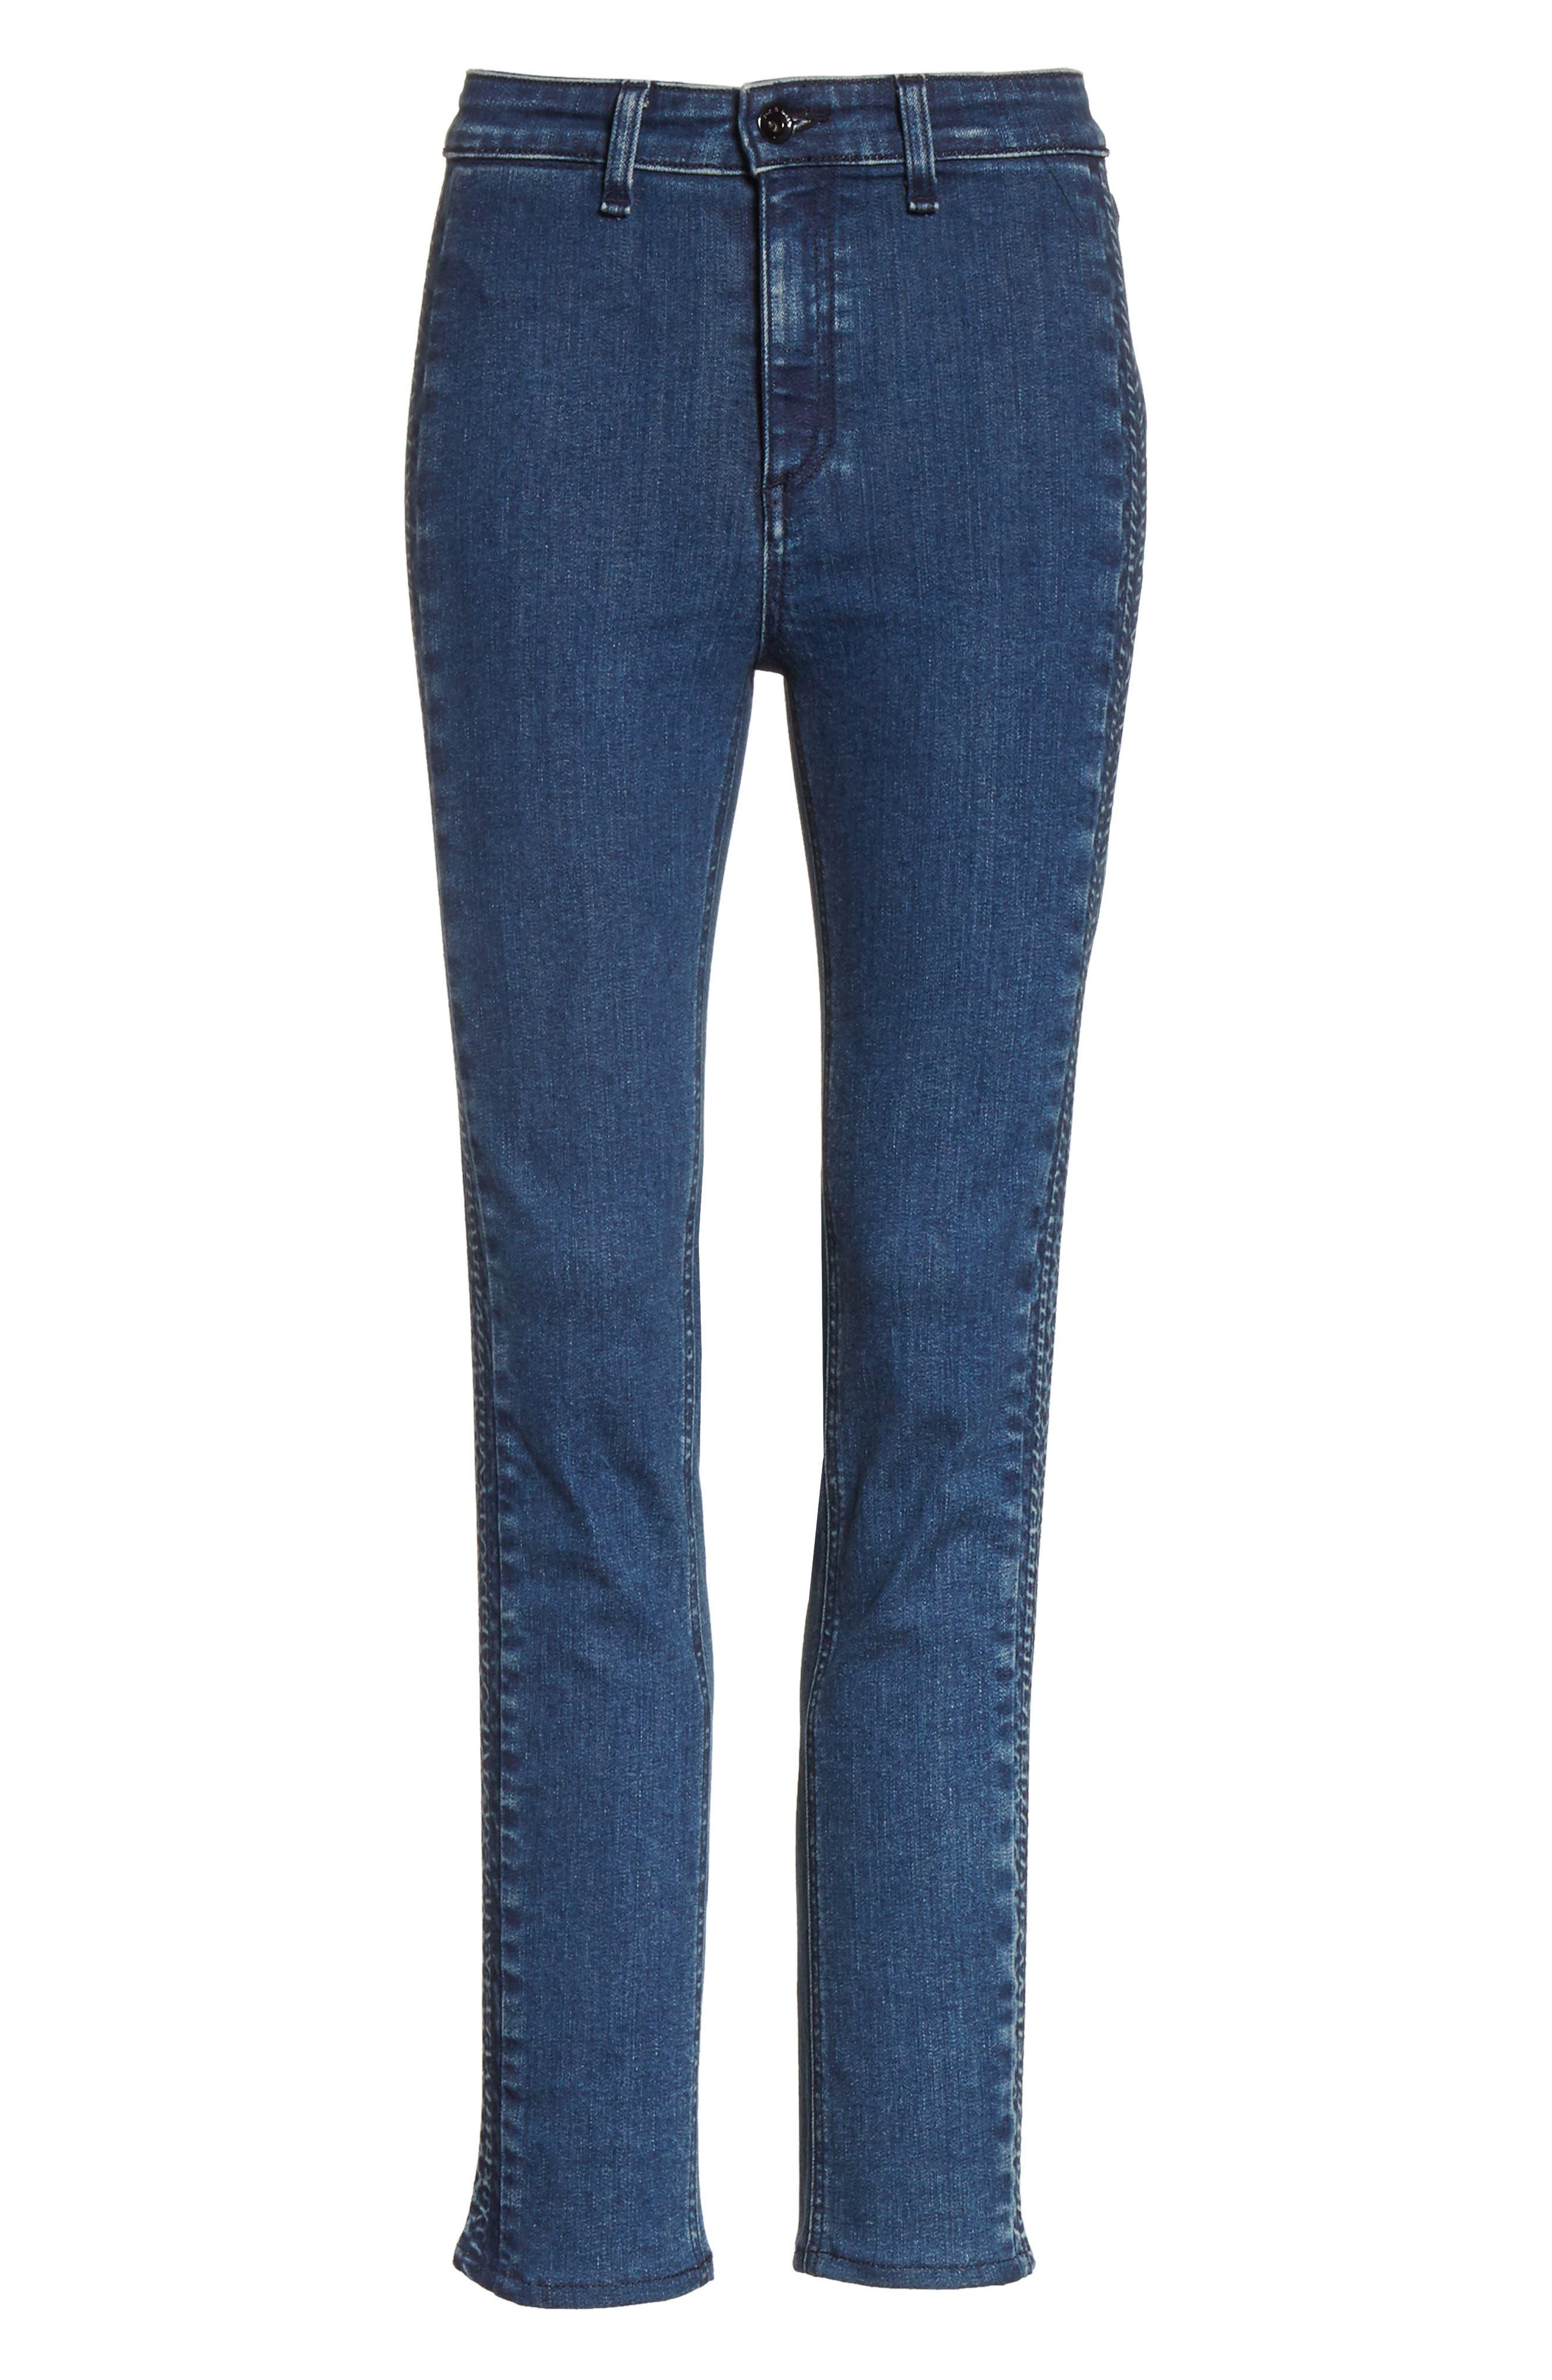 Ranata Tuxedo Cigarette Jeans,                             Alternate thumbnail 6, color,